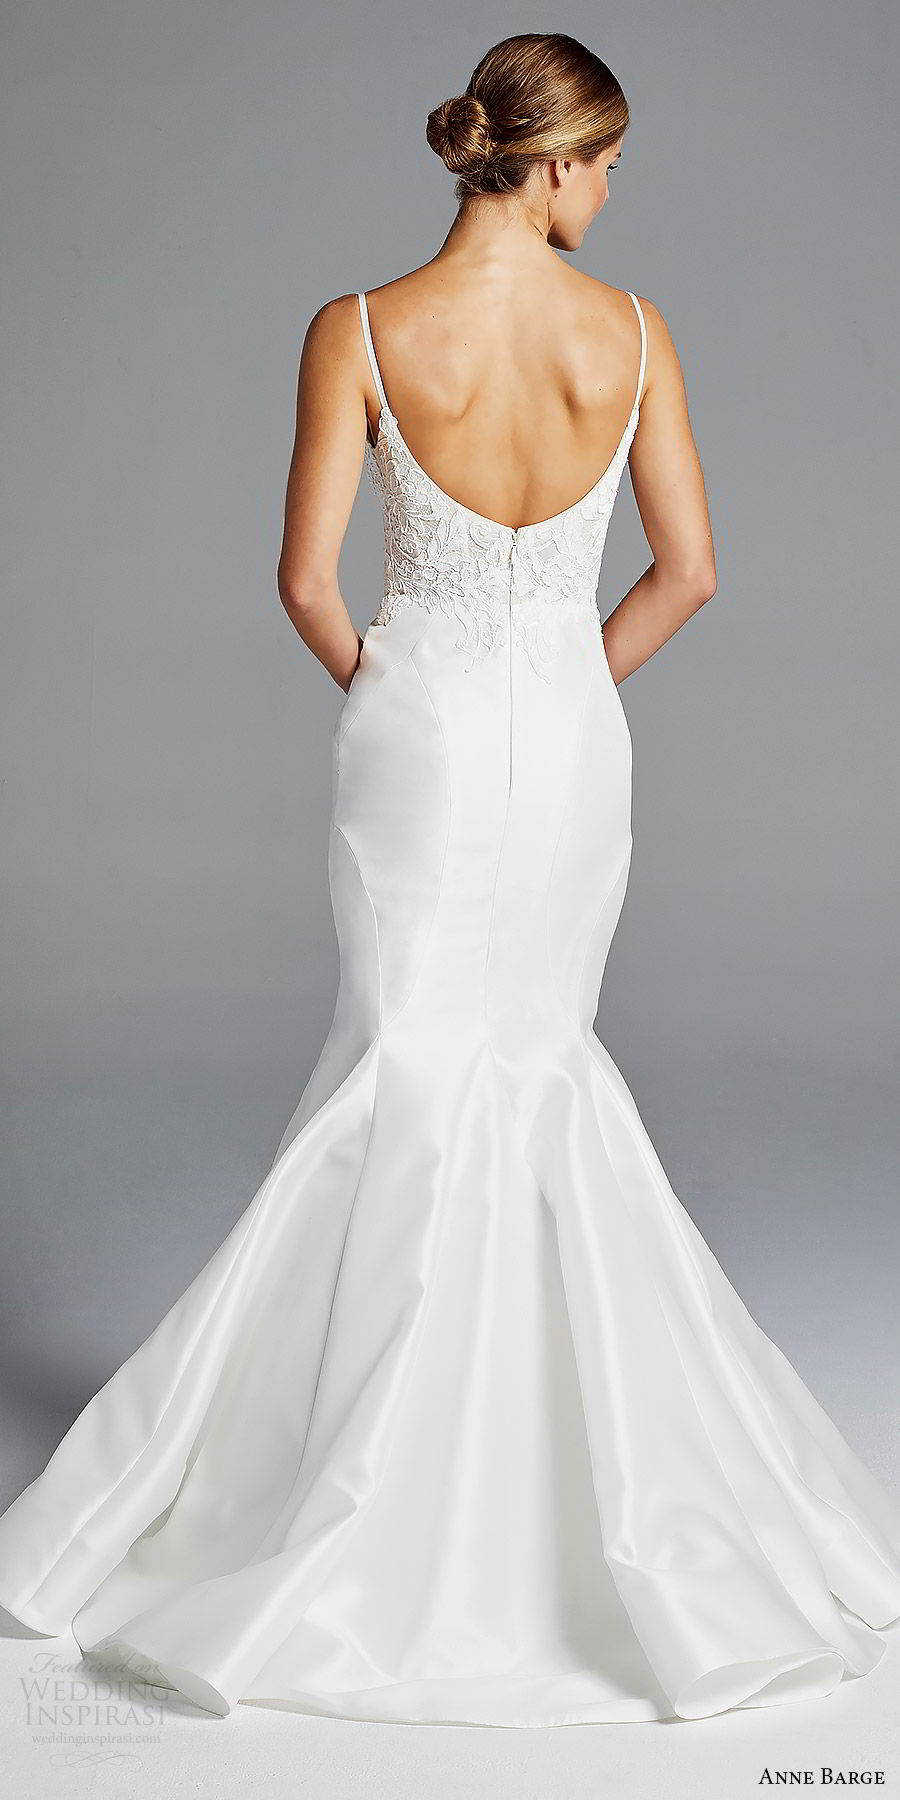 anne barge bridal spring 2019 sleeveless straps sweetheart lace bodice mermaid wedding dress (iman) bv scoop back modern elegant